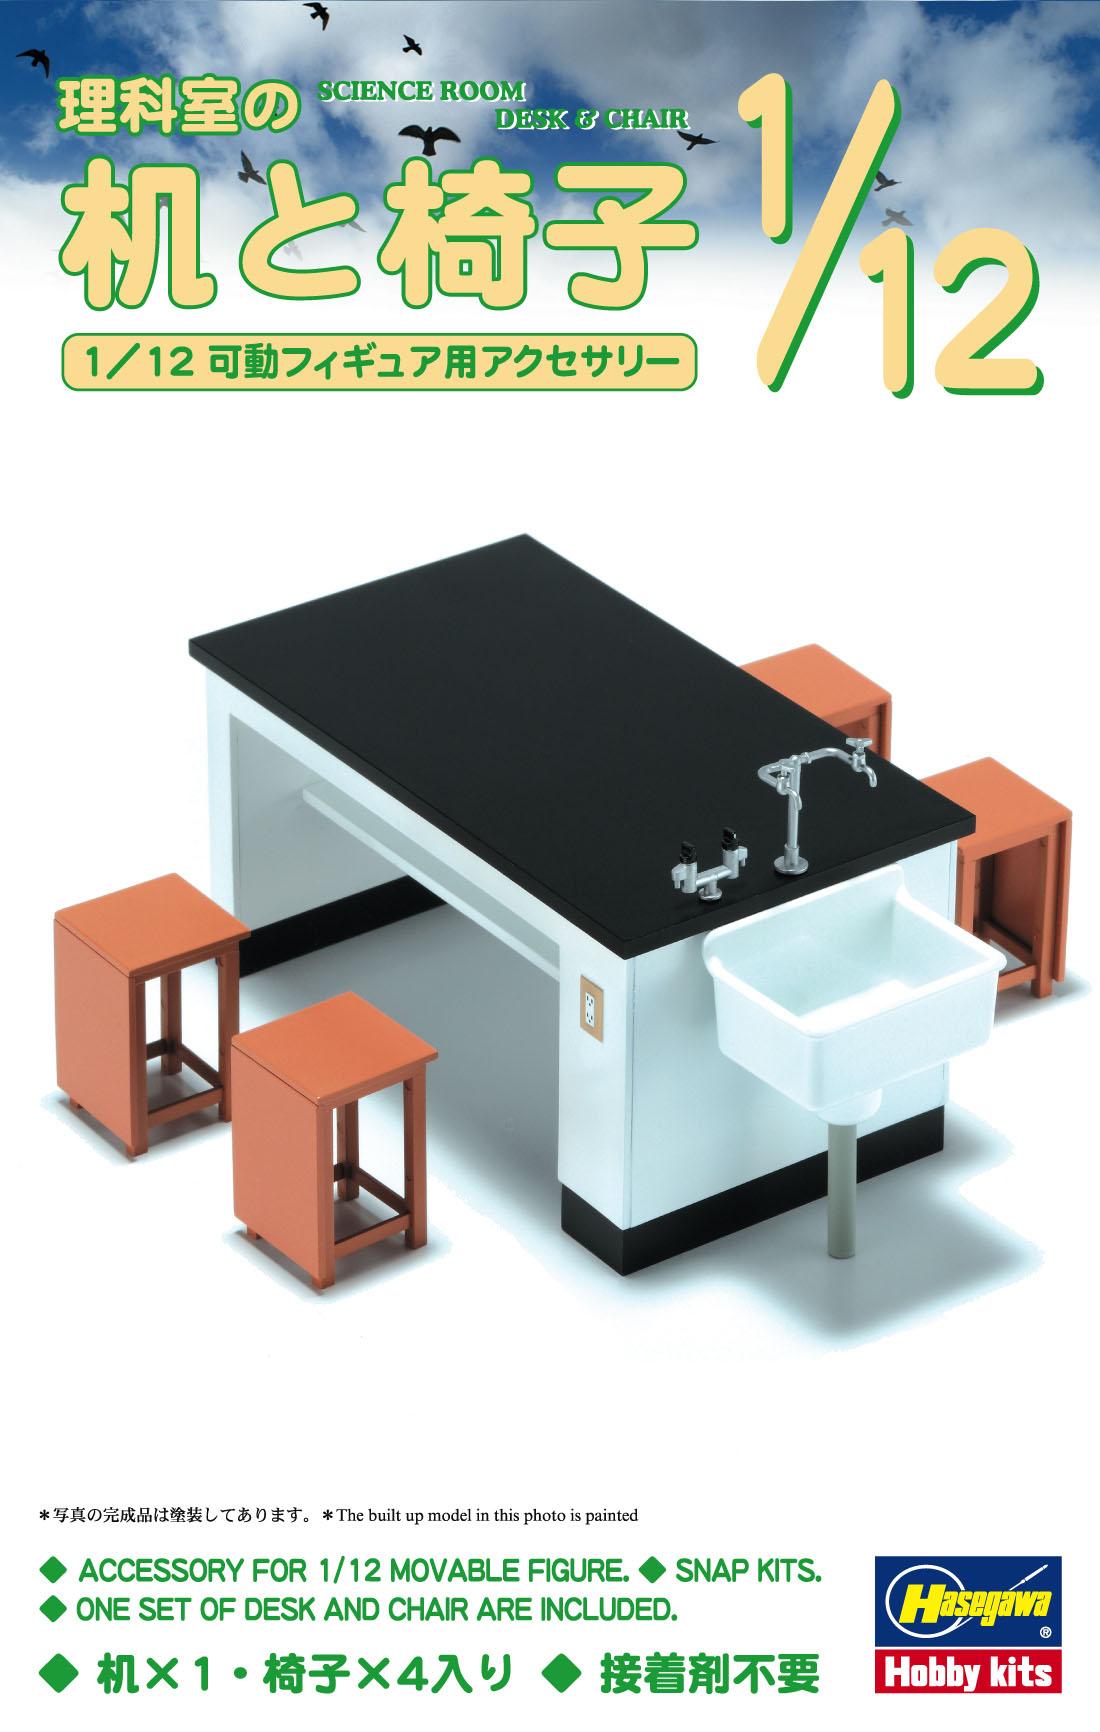 Hasegawa Science Room Desk & Chair